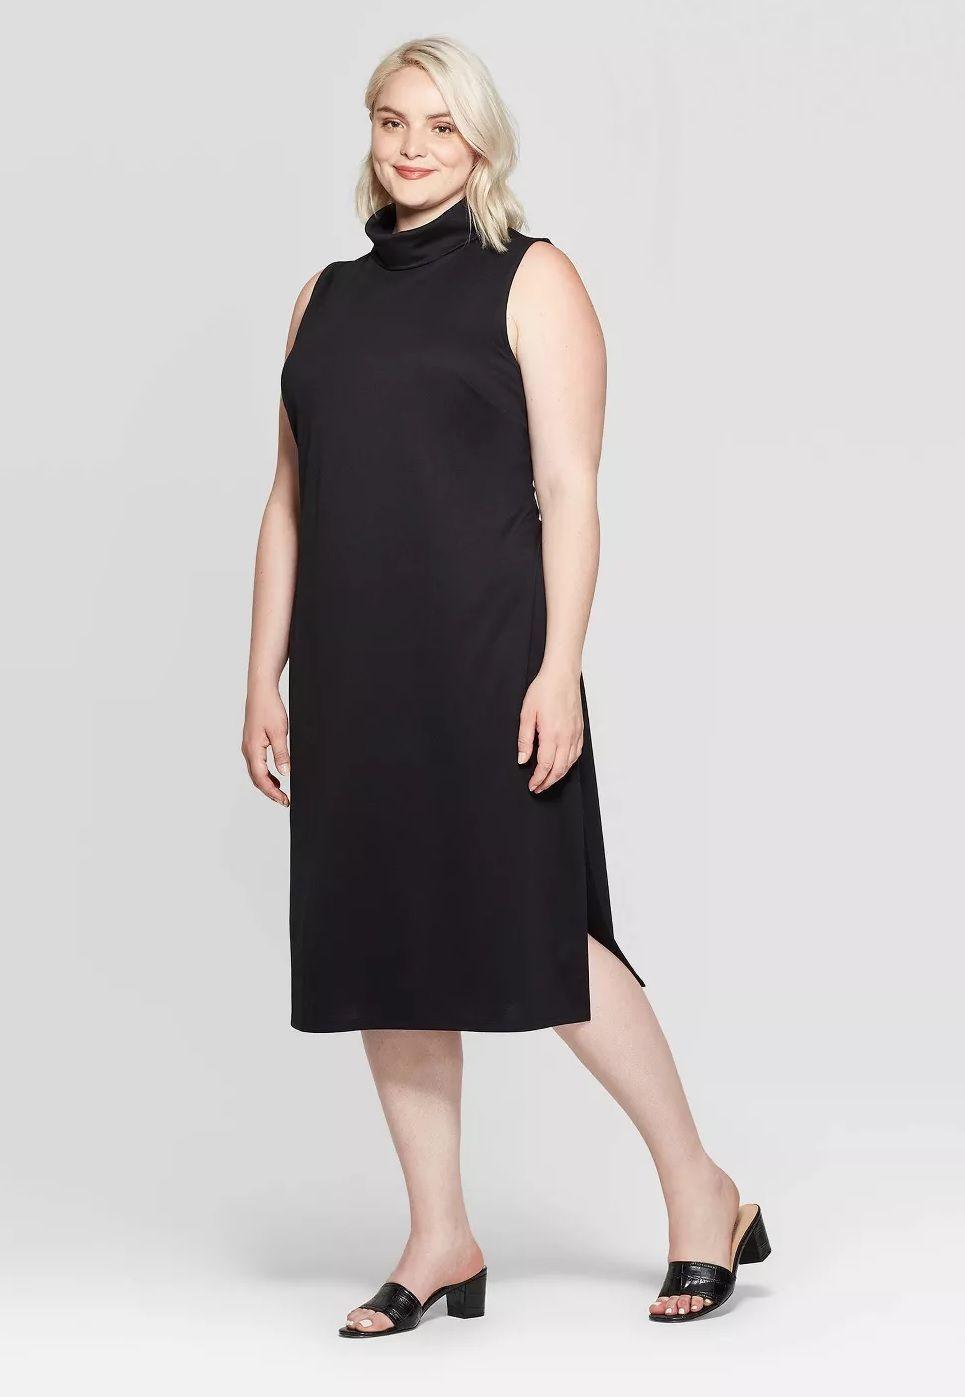 22+ Sleeveless turtleneck wedding dress ideas